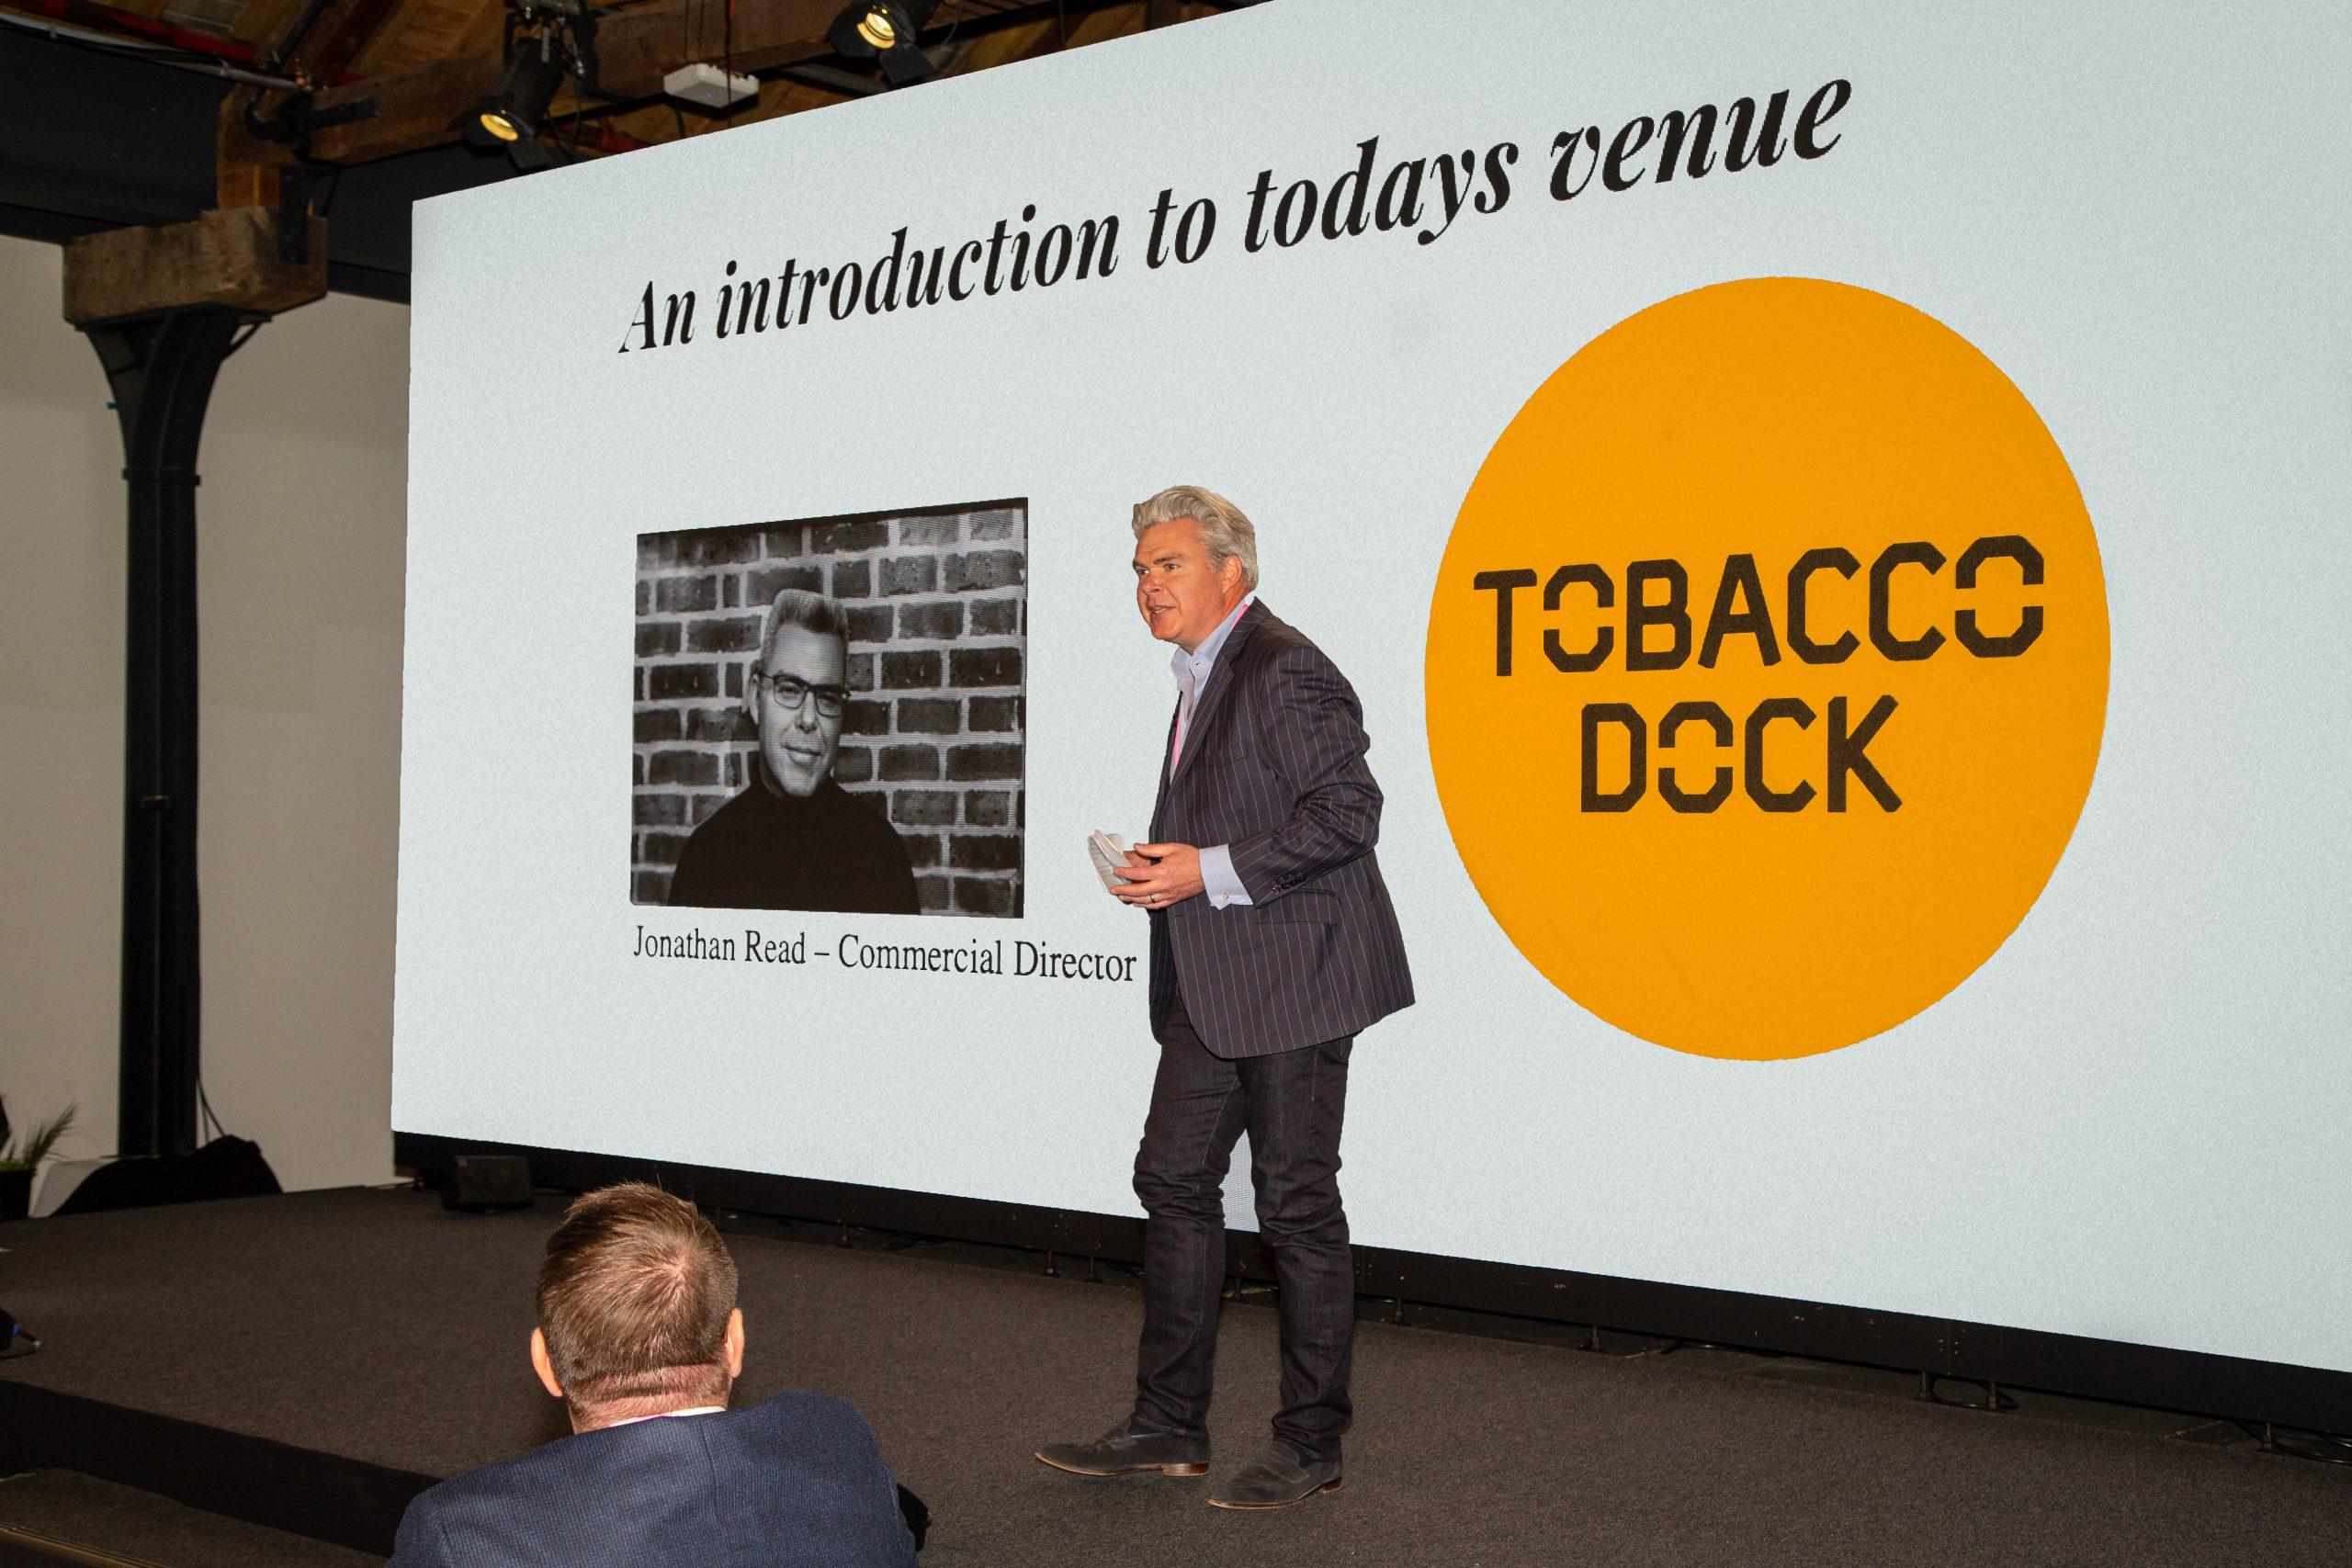 FF15 at Tobacco Dock